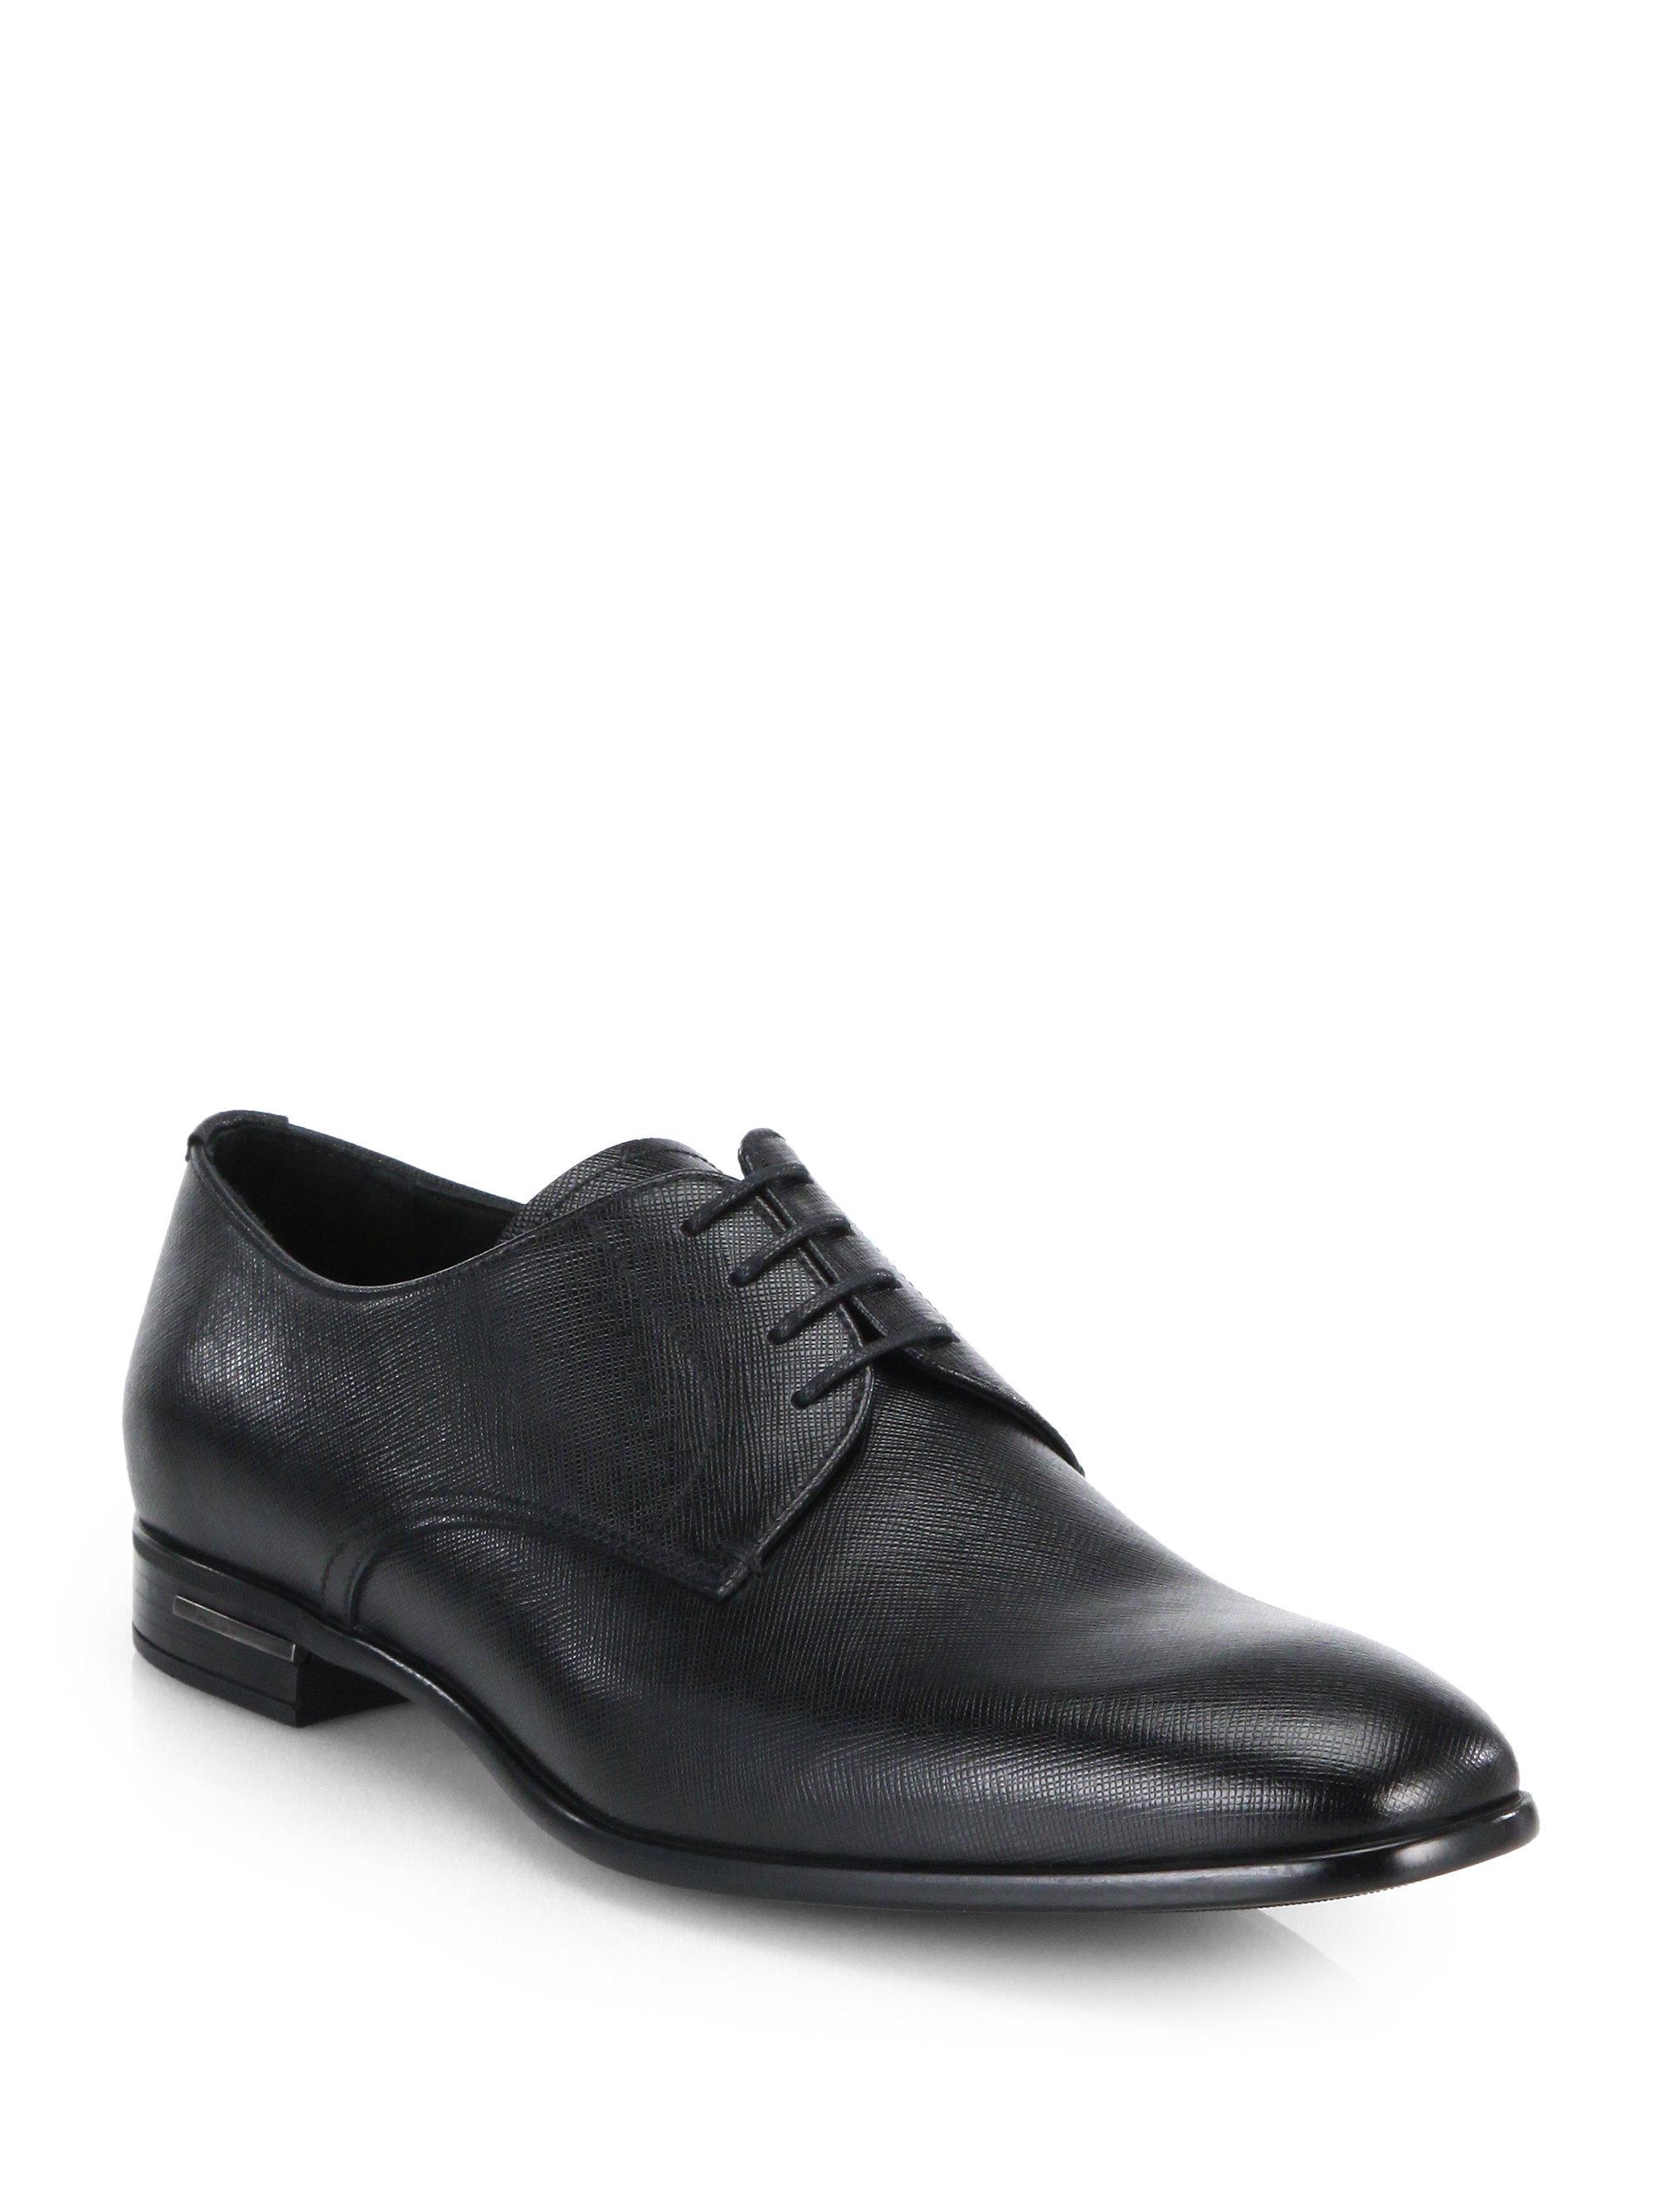 saffiano Oxford shoes - Black Prada Gb5Rw